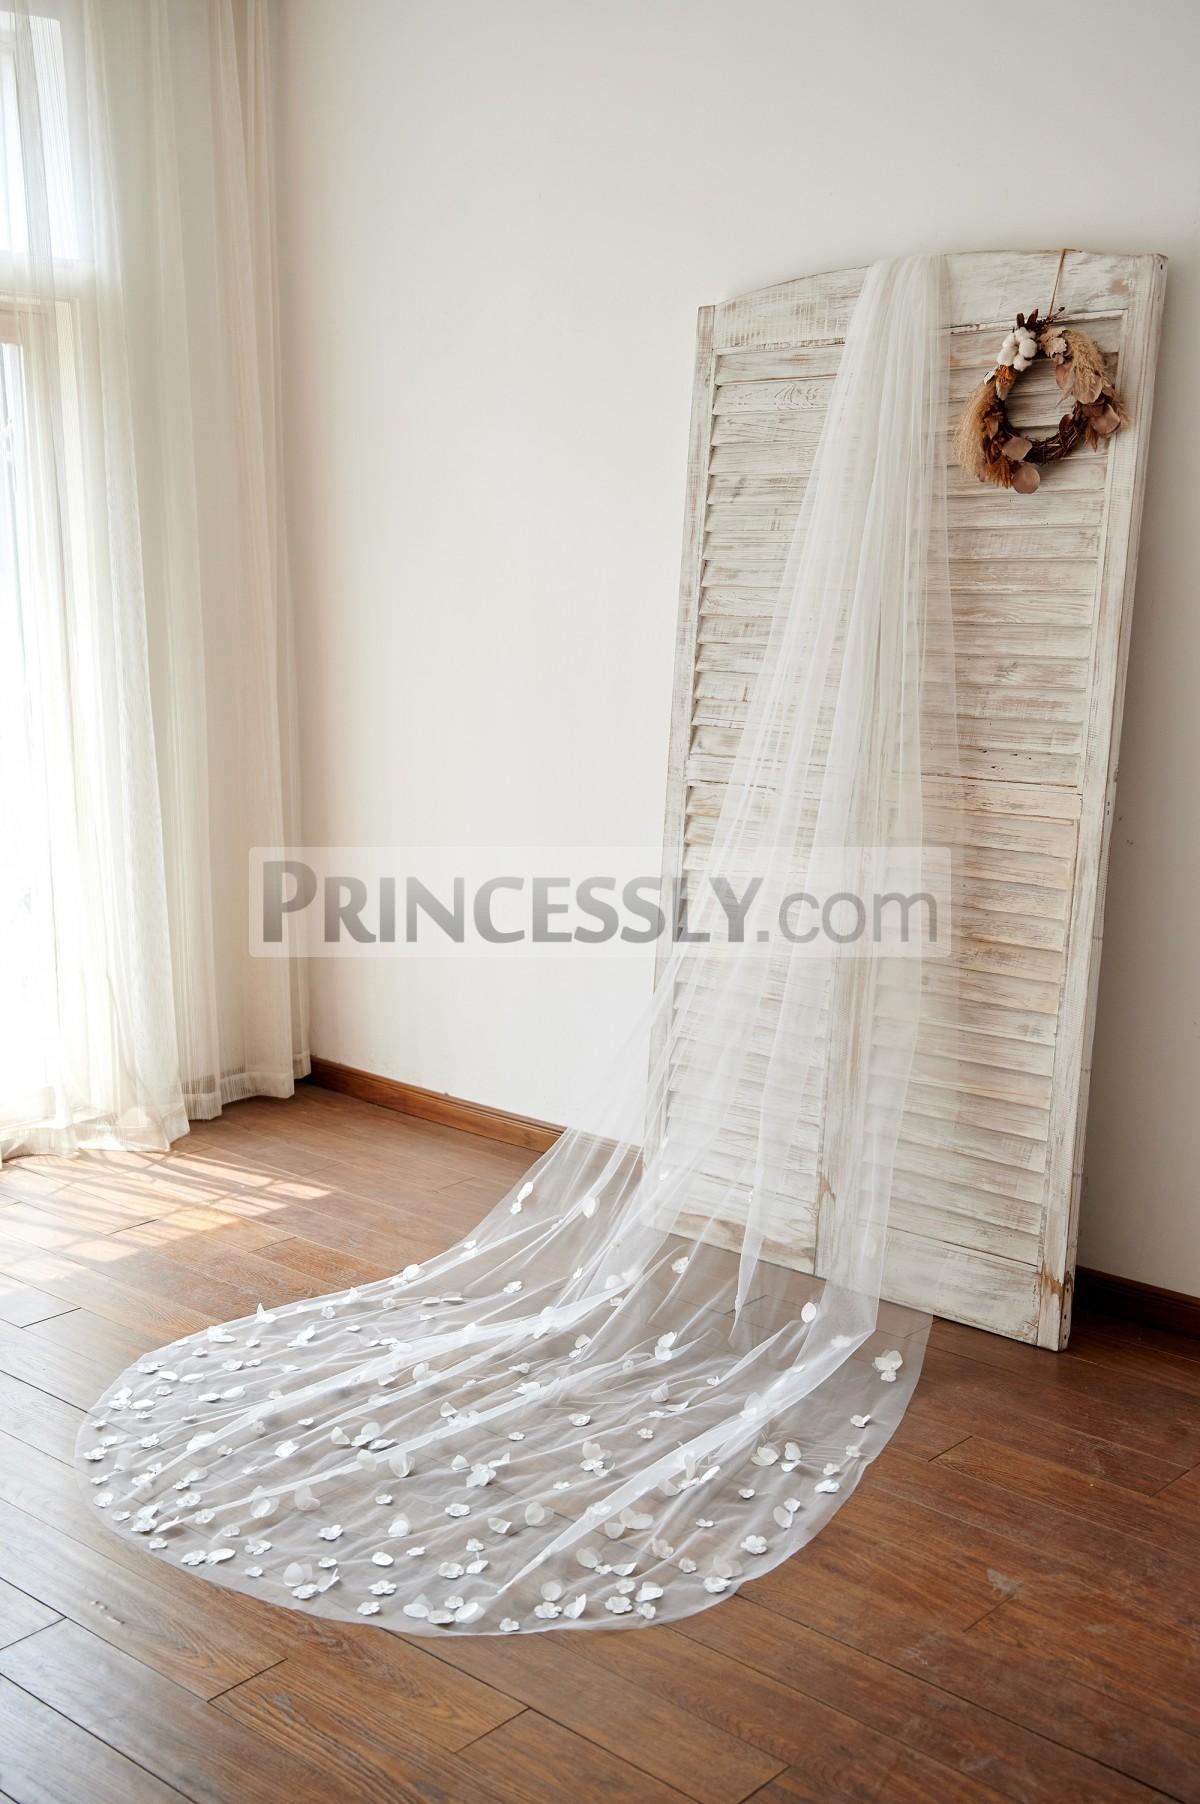 Princessly.com-K1003978-Handmade Petal Flowers Wedding Veil Cathedral Bridal Veil-31